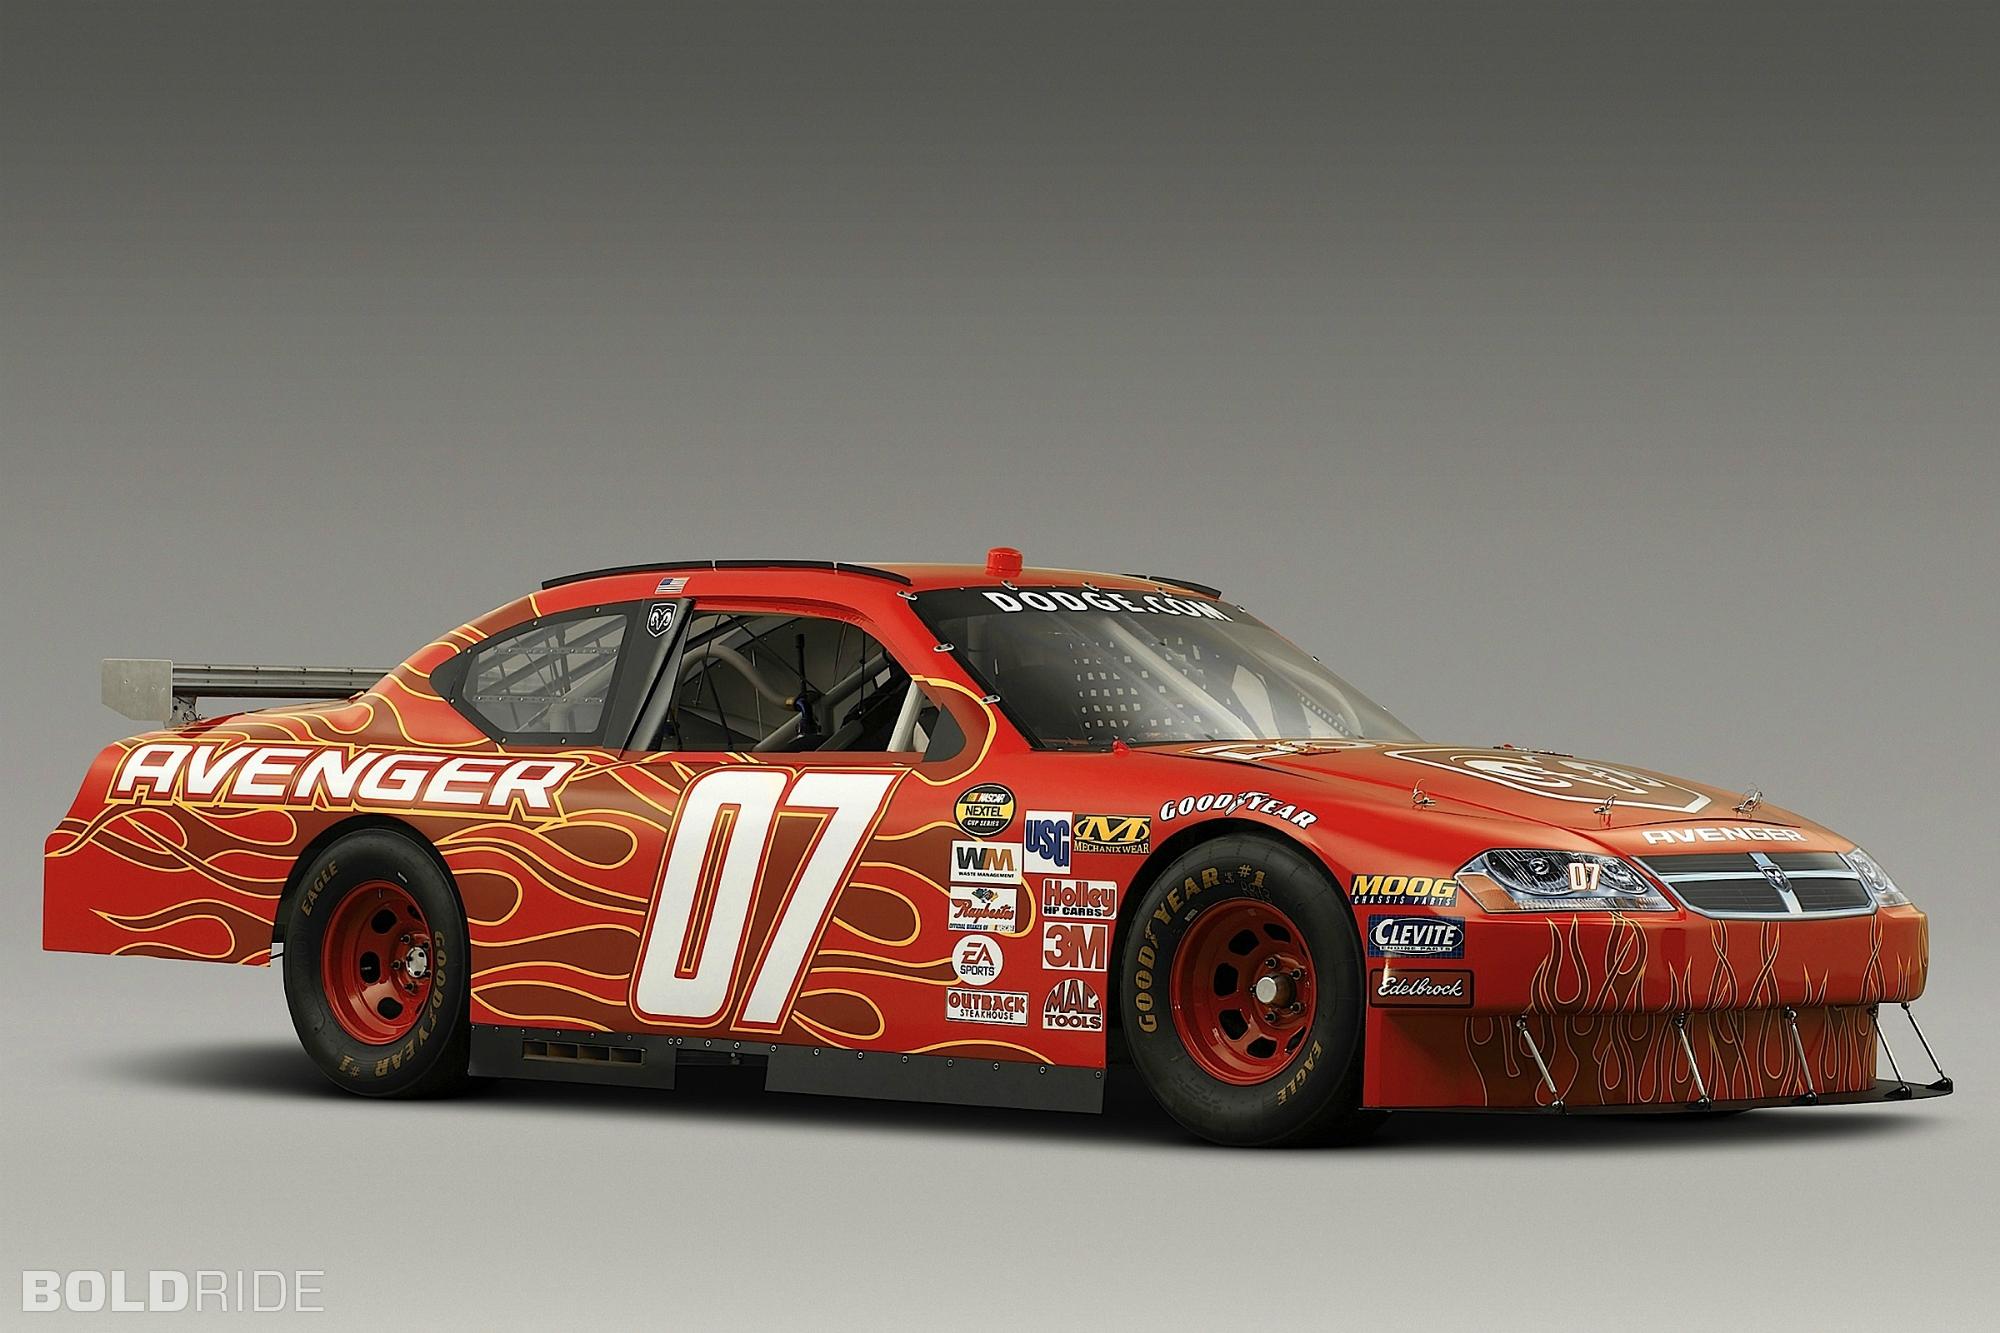 dodge-avenger-nascar-race-car-1322586849-8600